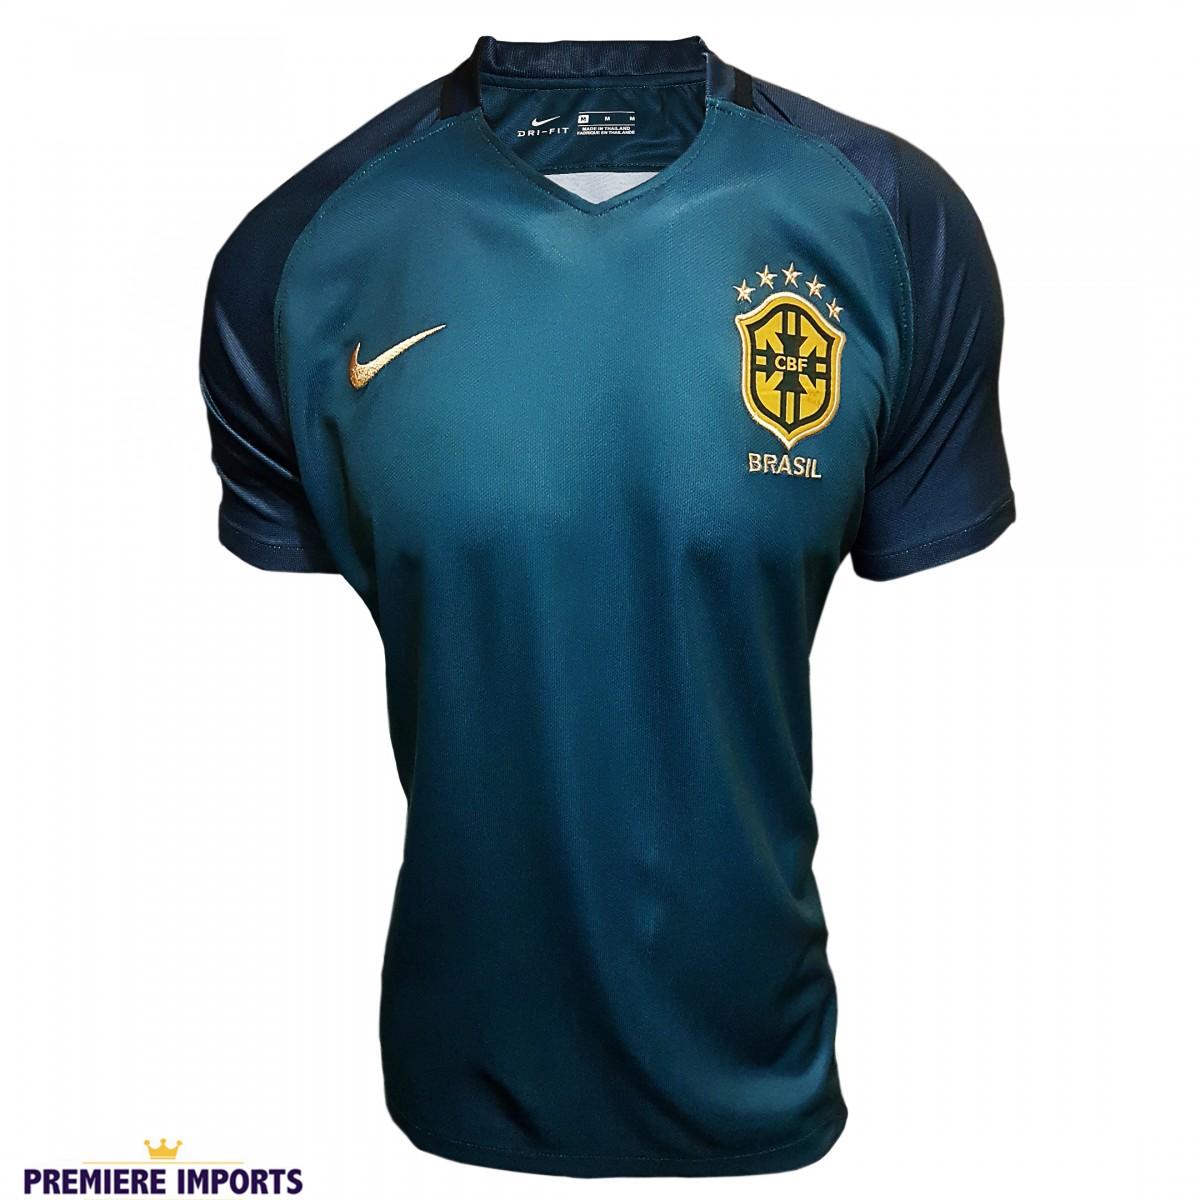 Foto 1 - Camisa Oficial Brasil Alternativa